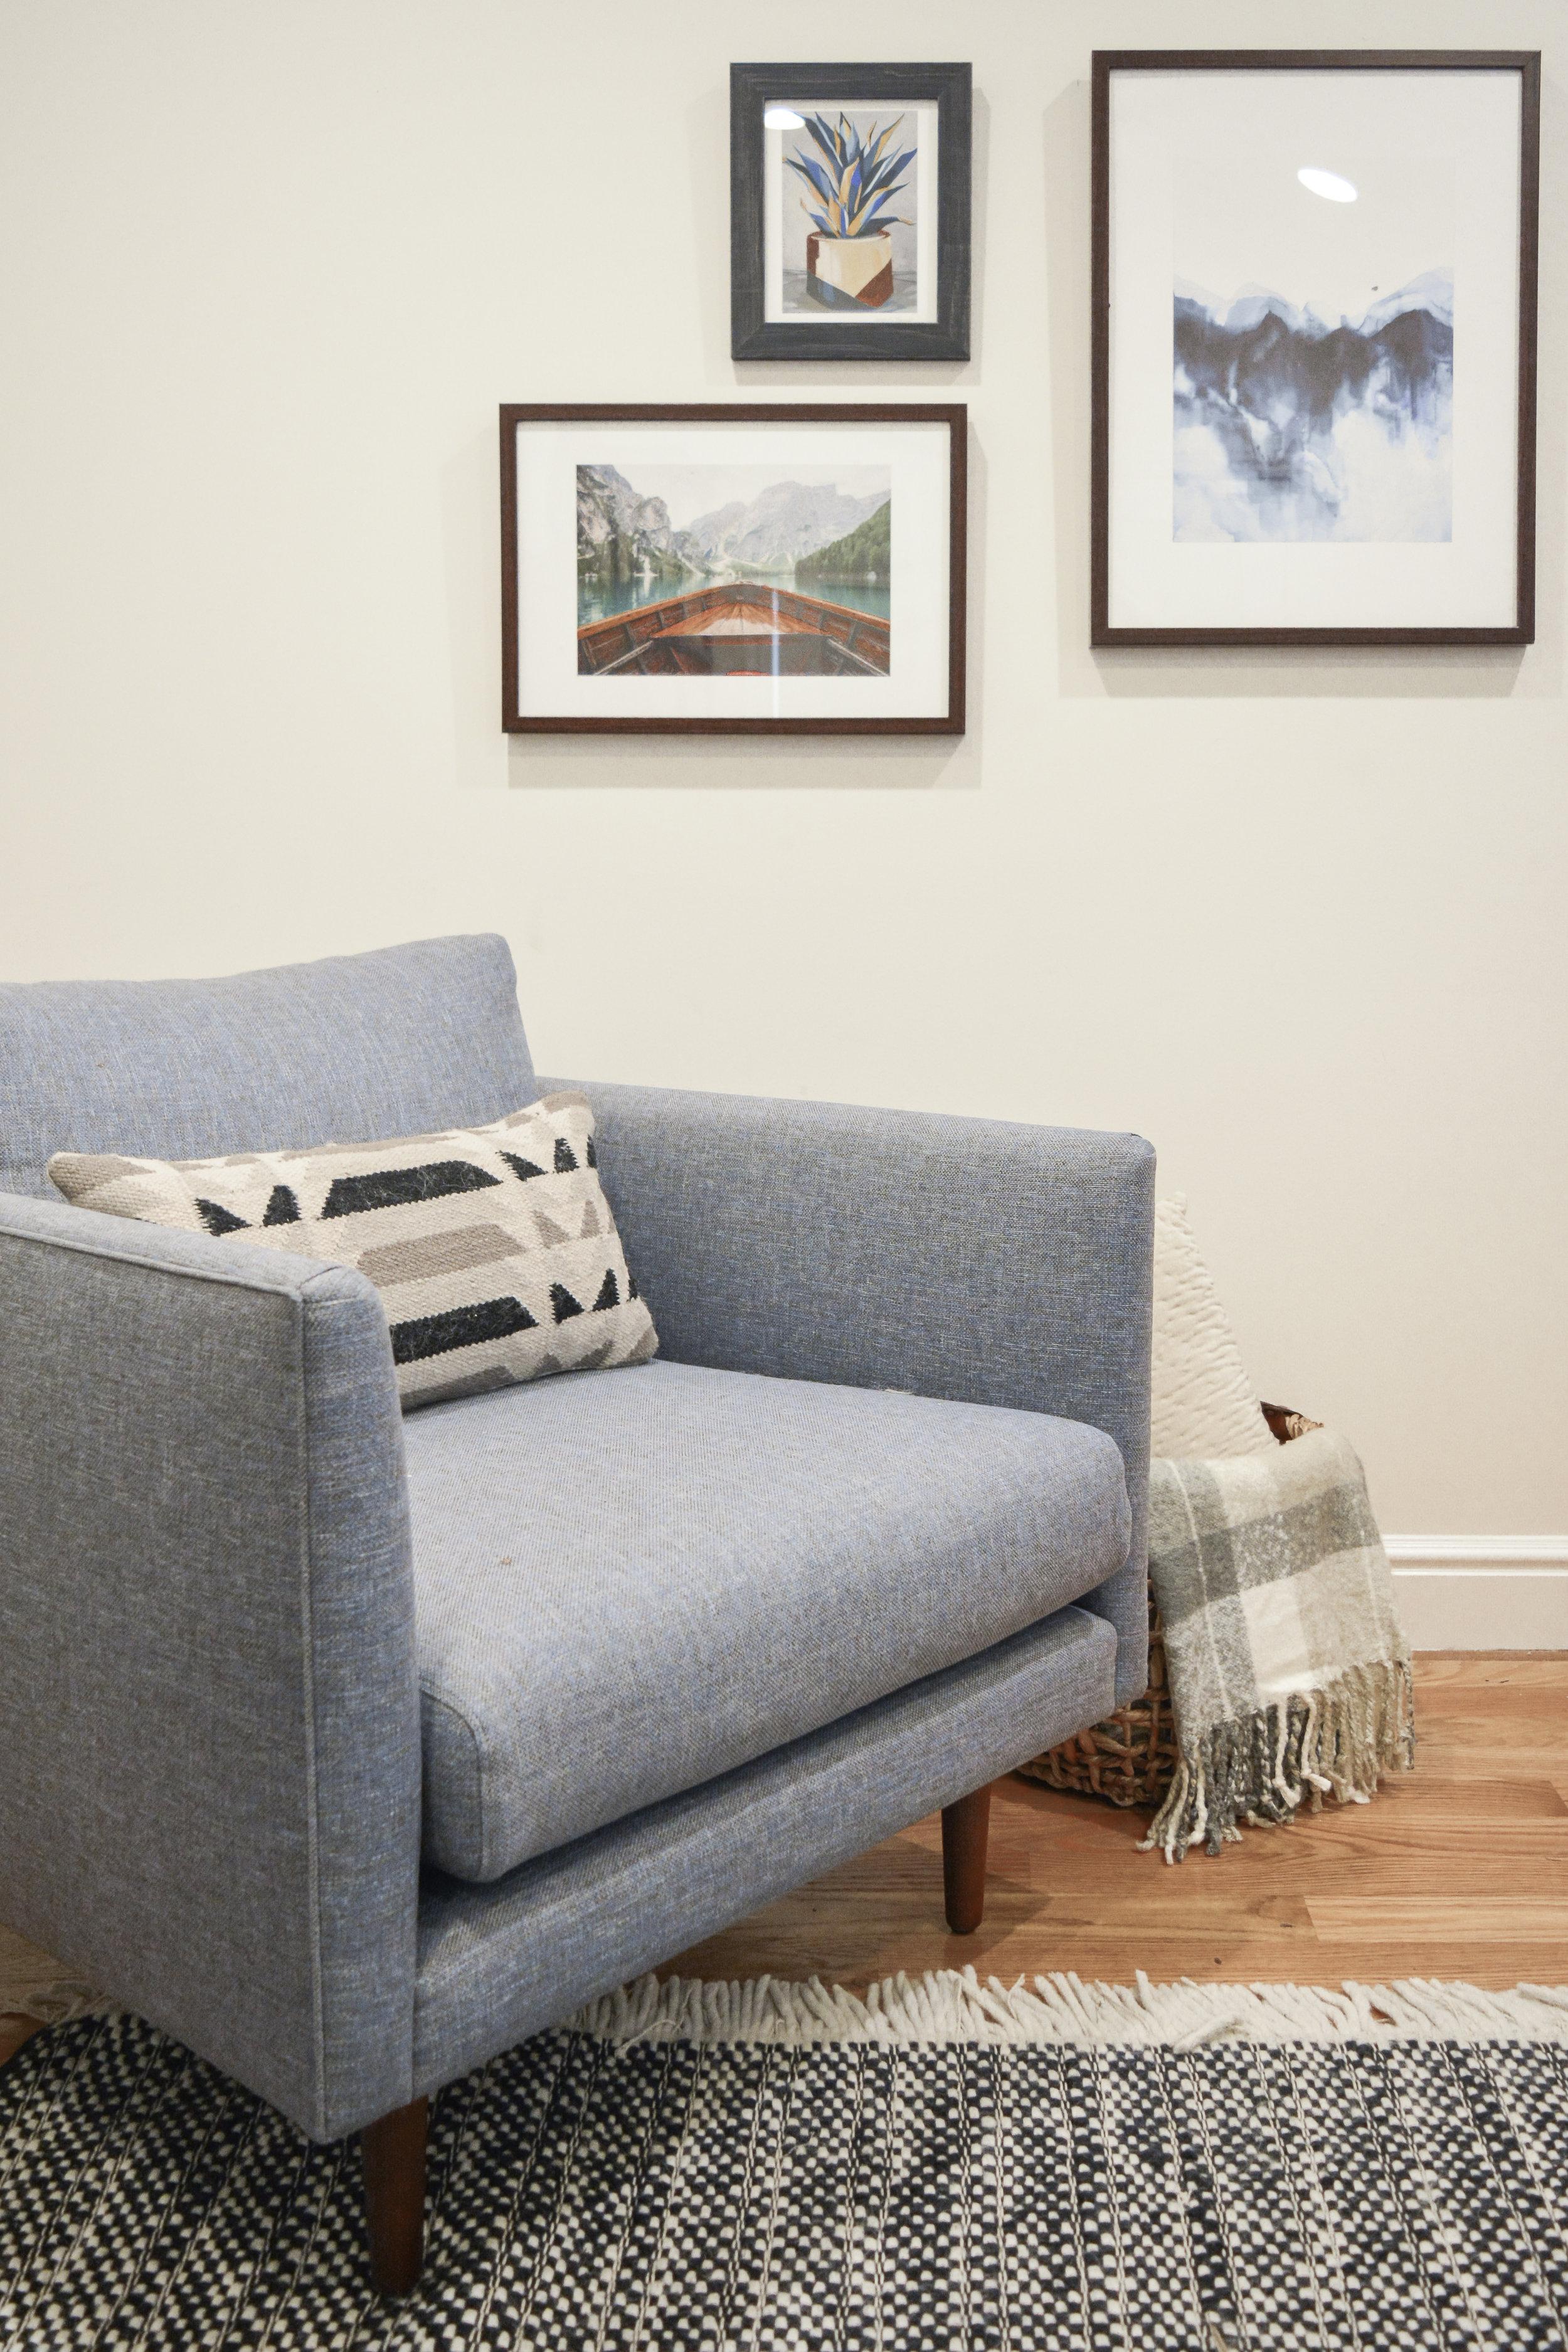 Angela Grace Design // Judah Living Room and Dining // San Francisco and SF Bay Area Interior Designer, Decorator